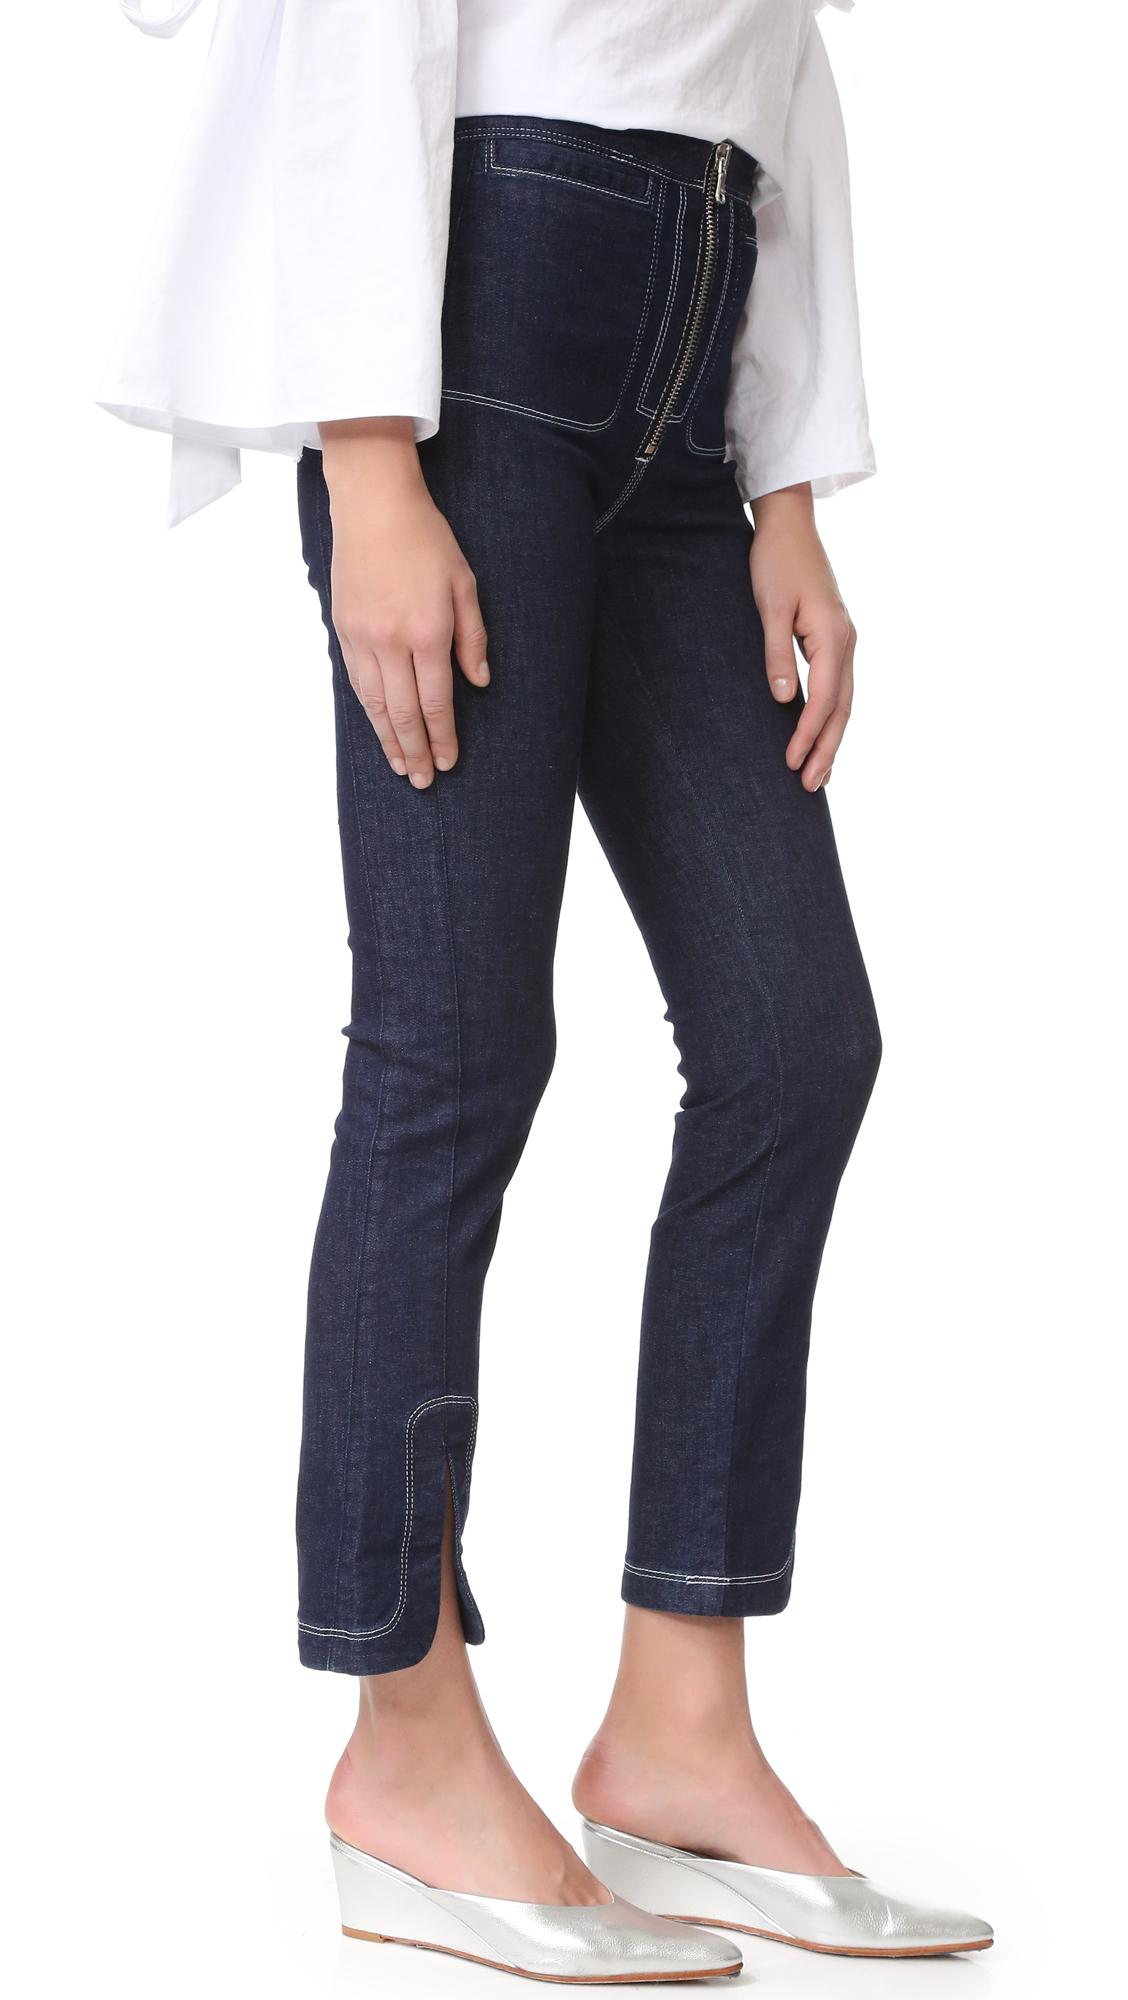 Rachel Comey Denim Maga Jeans in Dark Indigo (Blue)